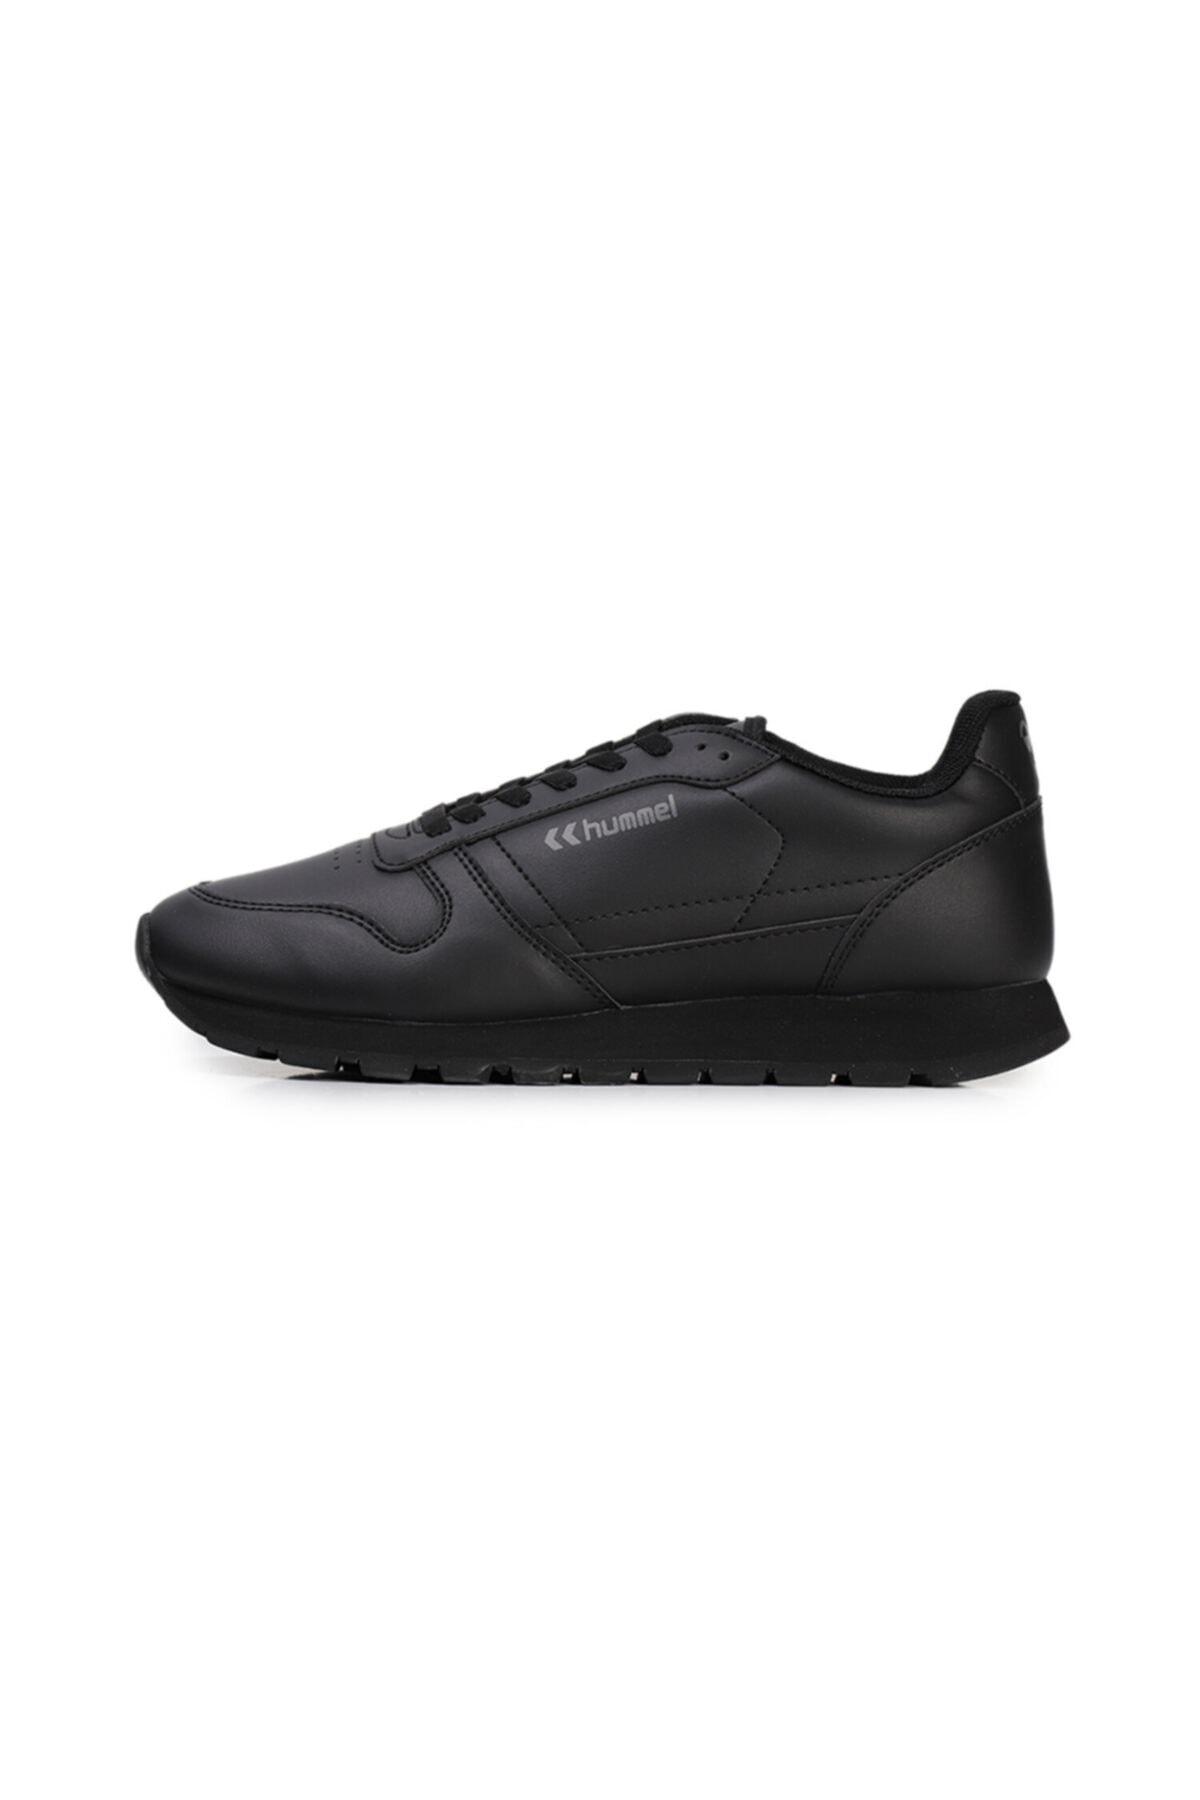 HUMMEL STREET Siyah Erkek Sneaker Ayakkabı 100351957 2